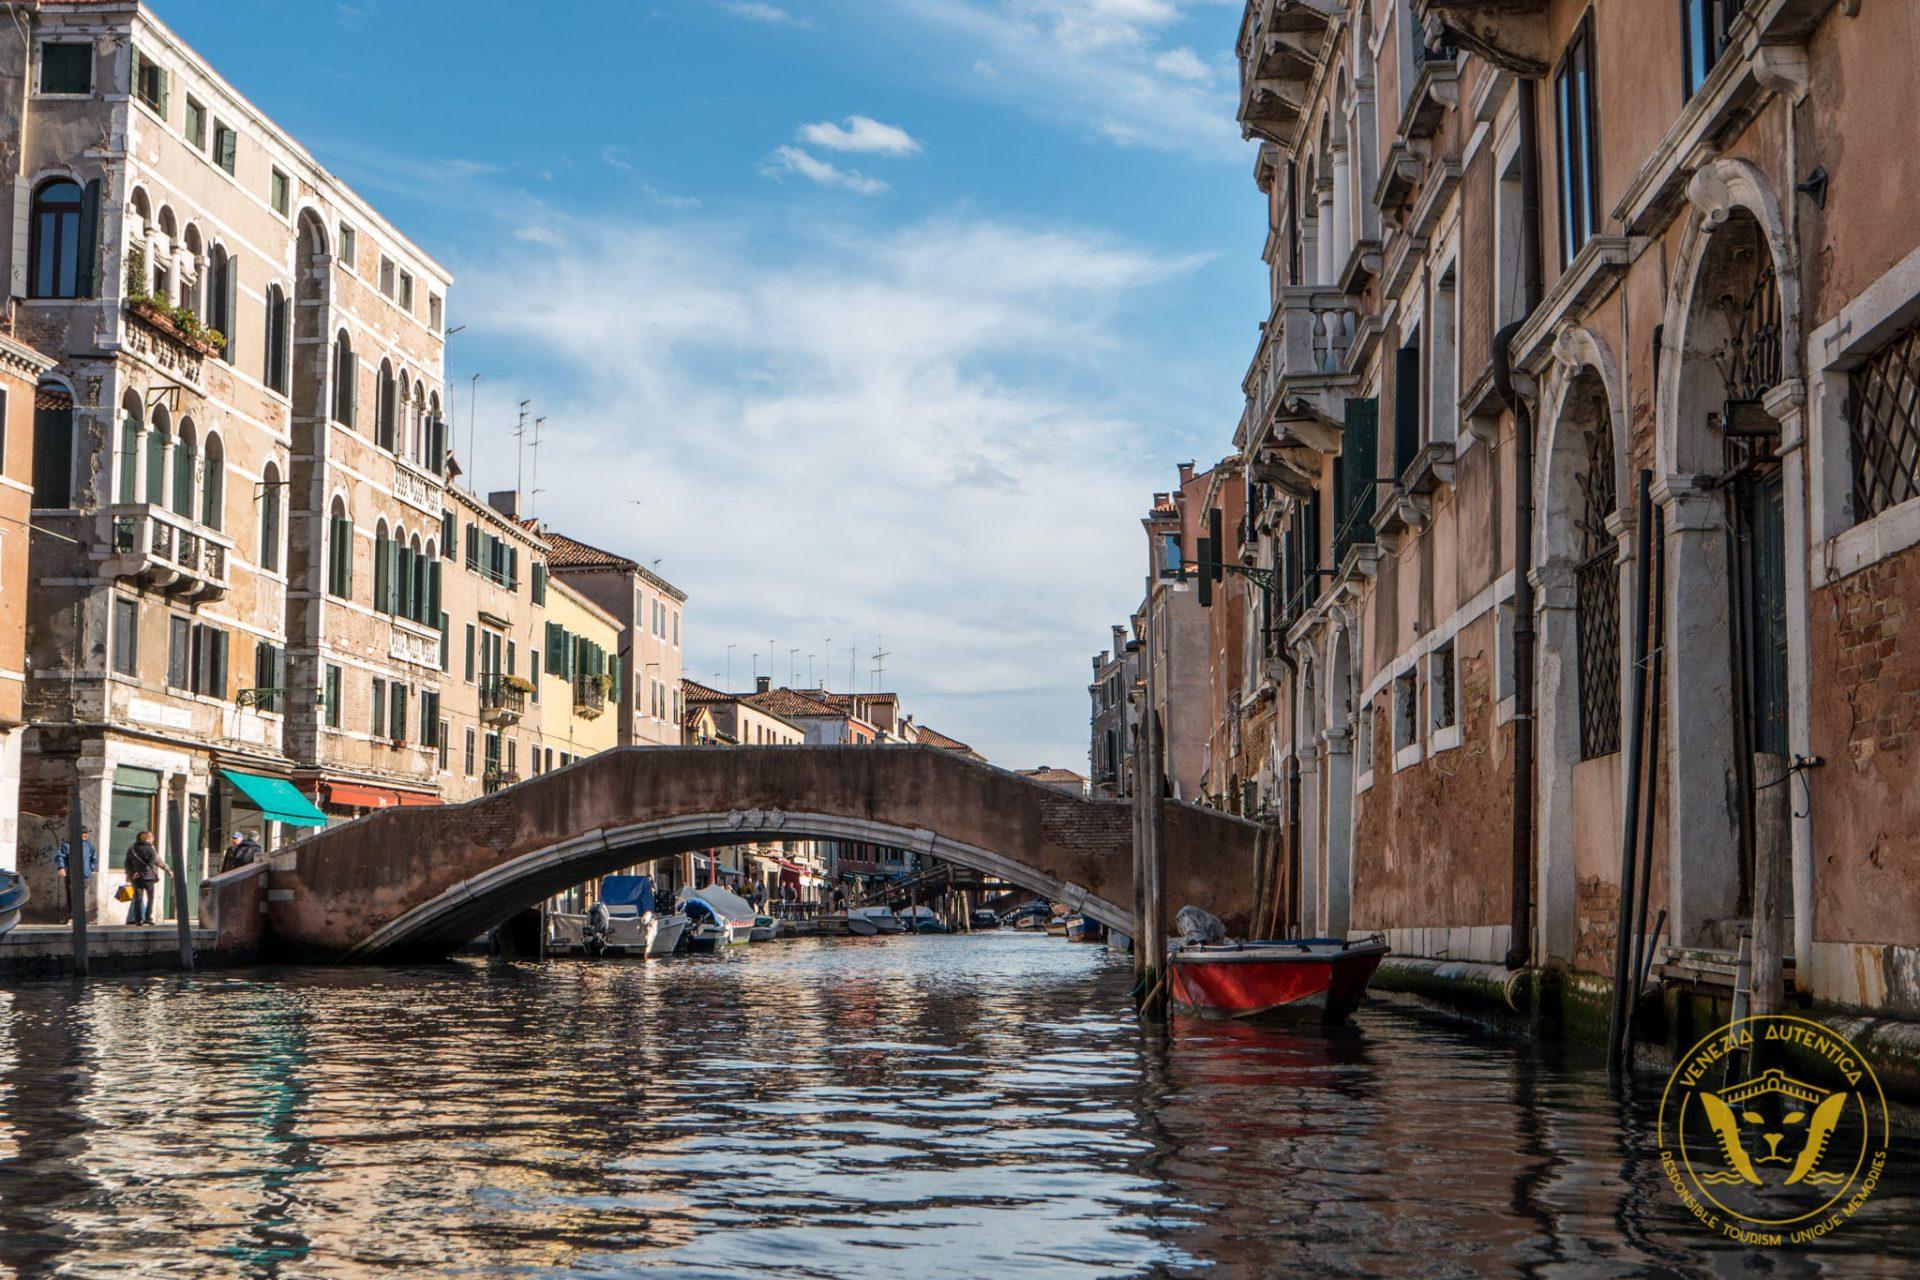 One of the 392 bridges in Venice